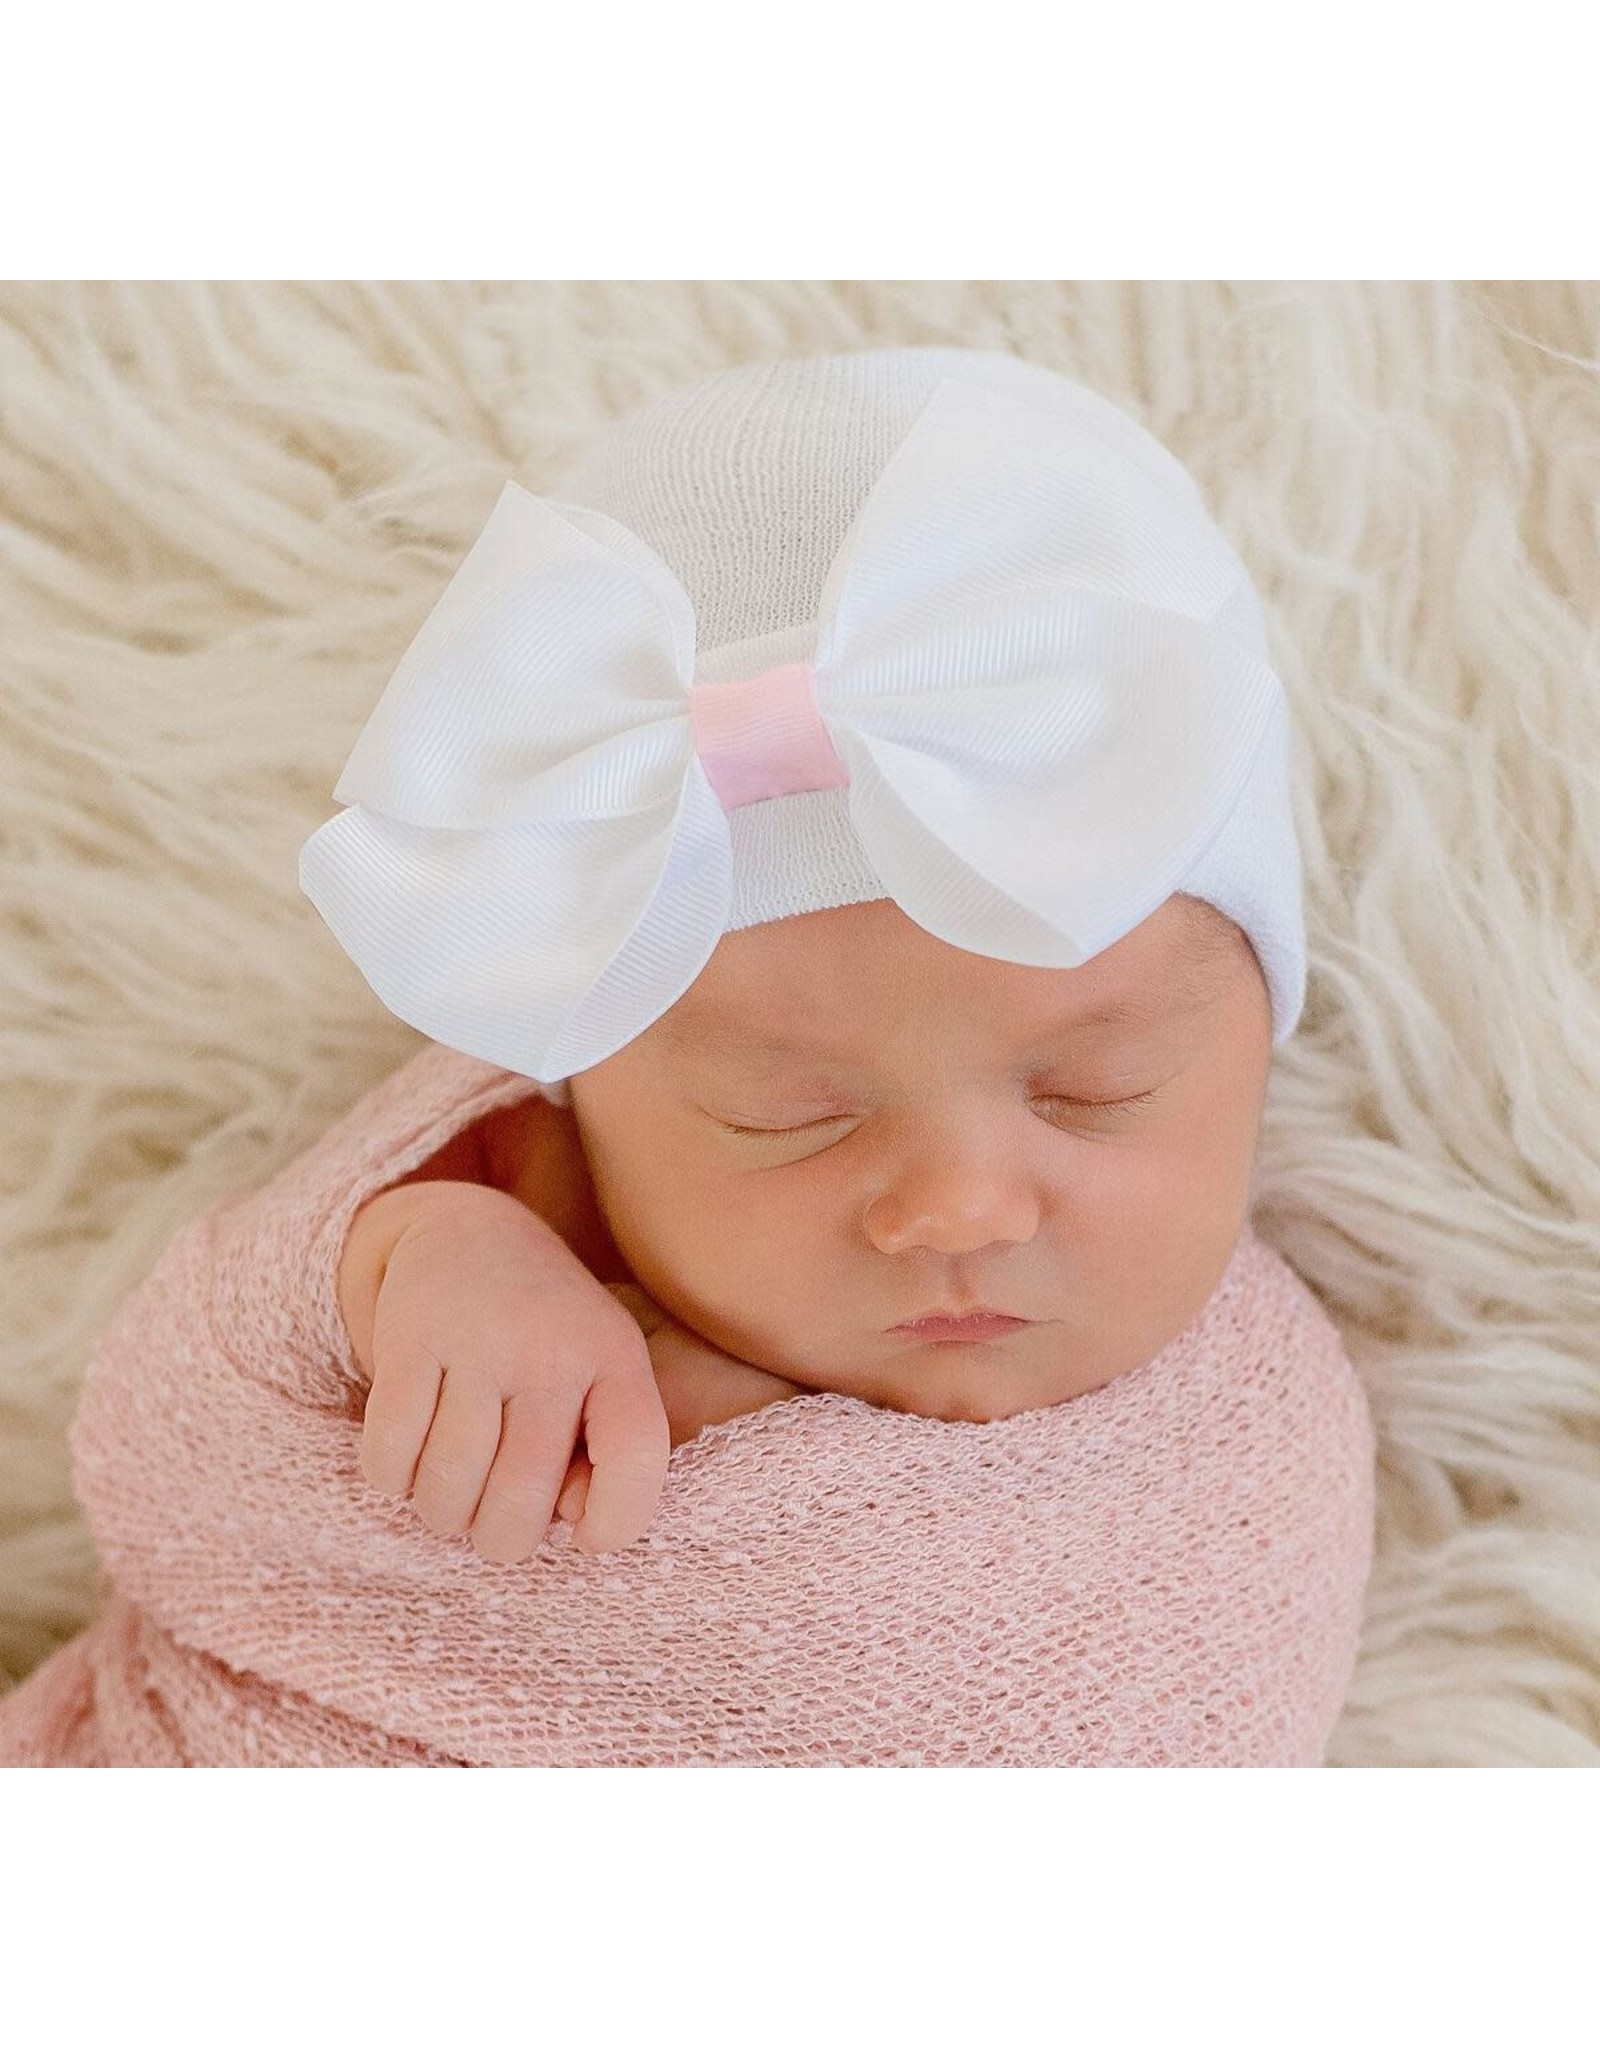 ILYBEAN Ilybean - Sophia Bow Nursery Beanie